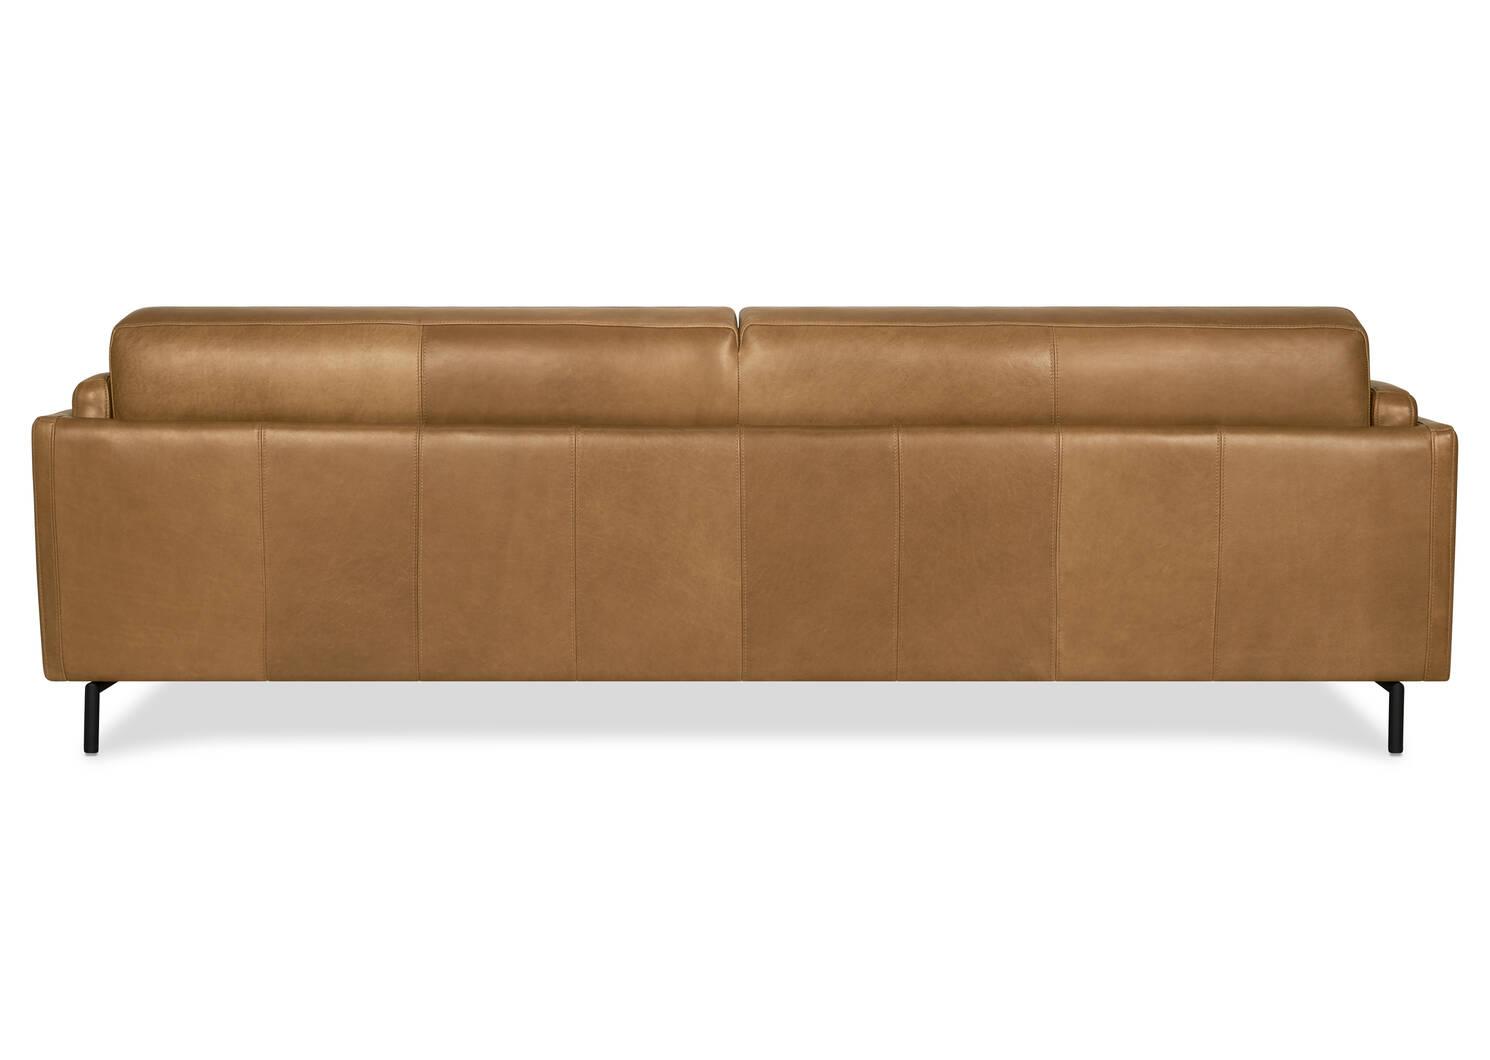 "Renfrew Leather Sofa 94"" -Adler Tan"